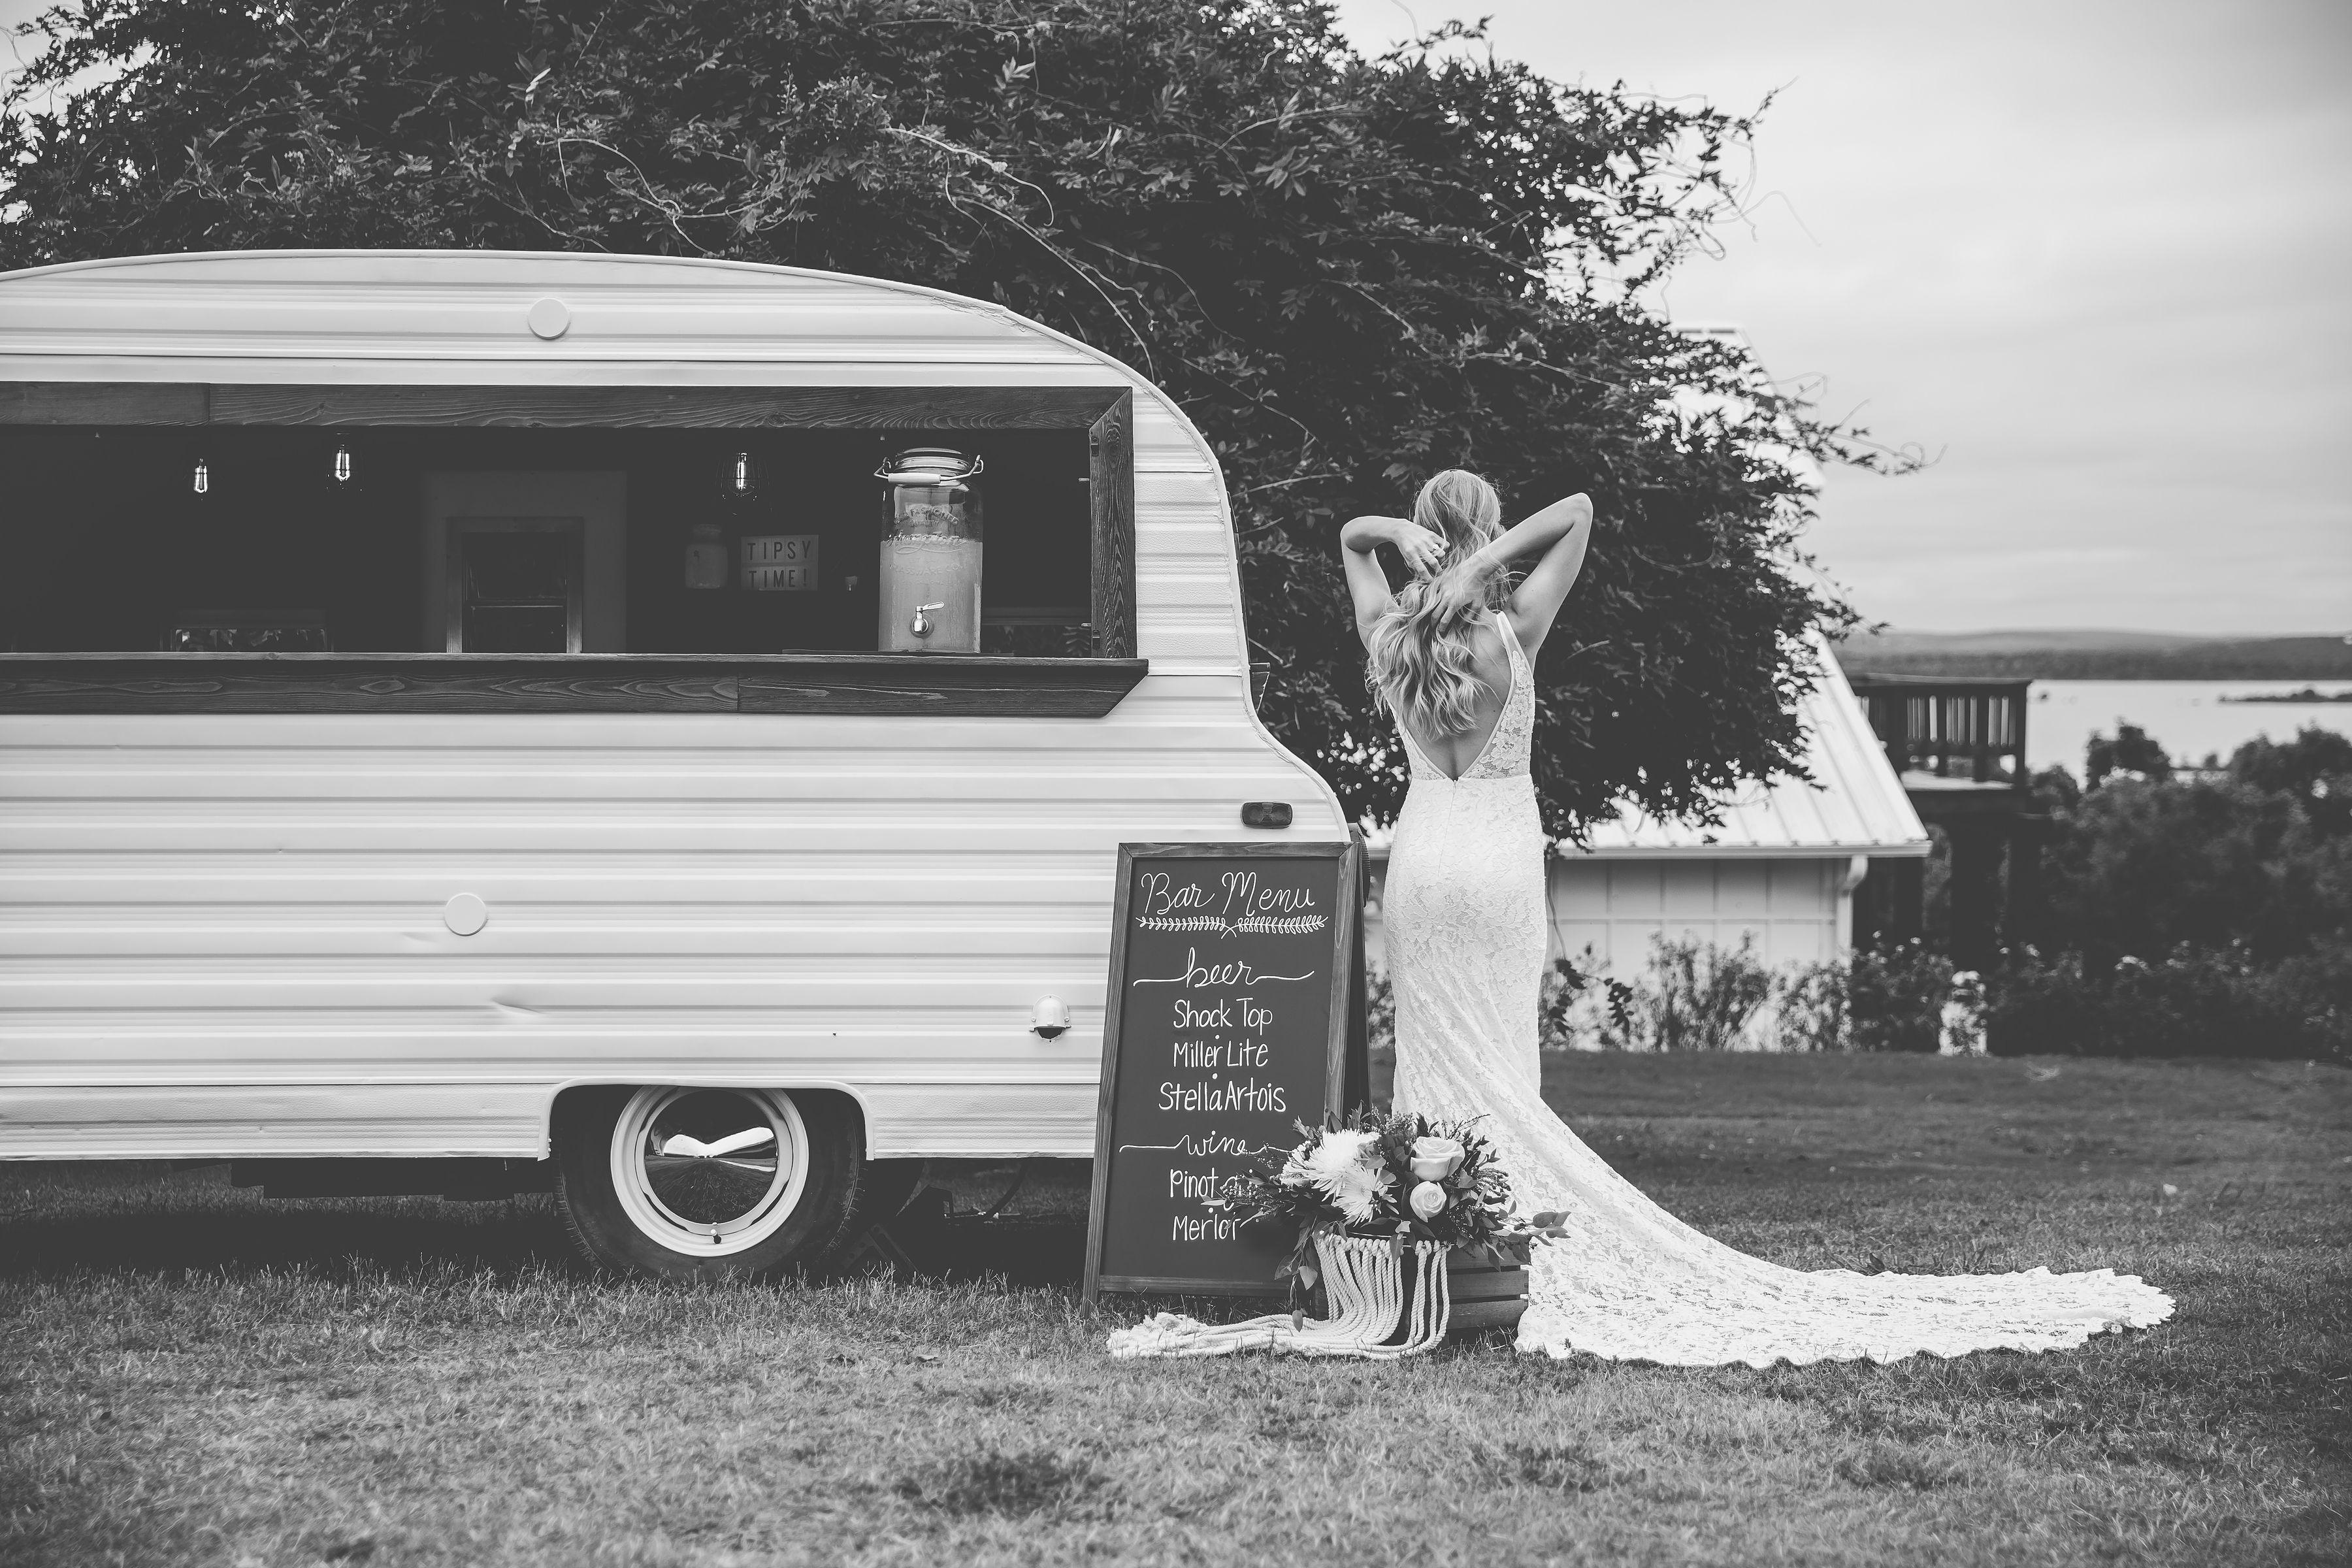 Photo Cred: Plum Pretty Wedding Phot